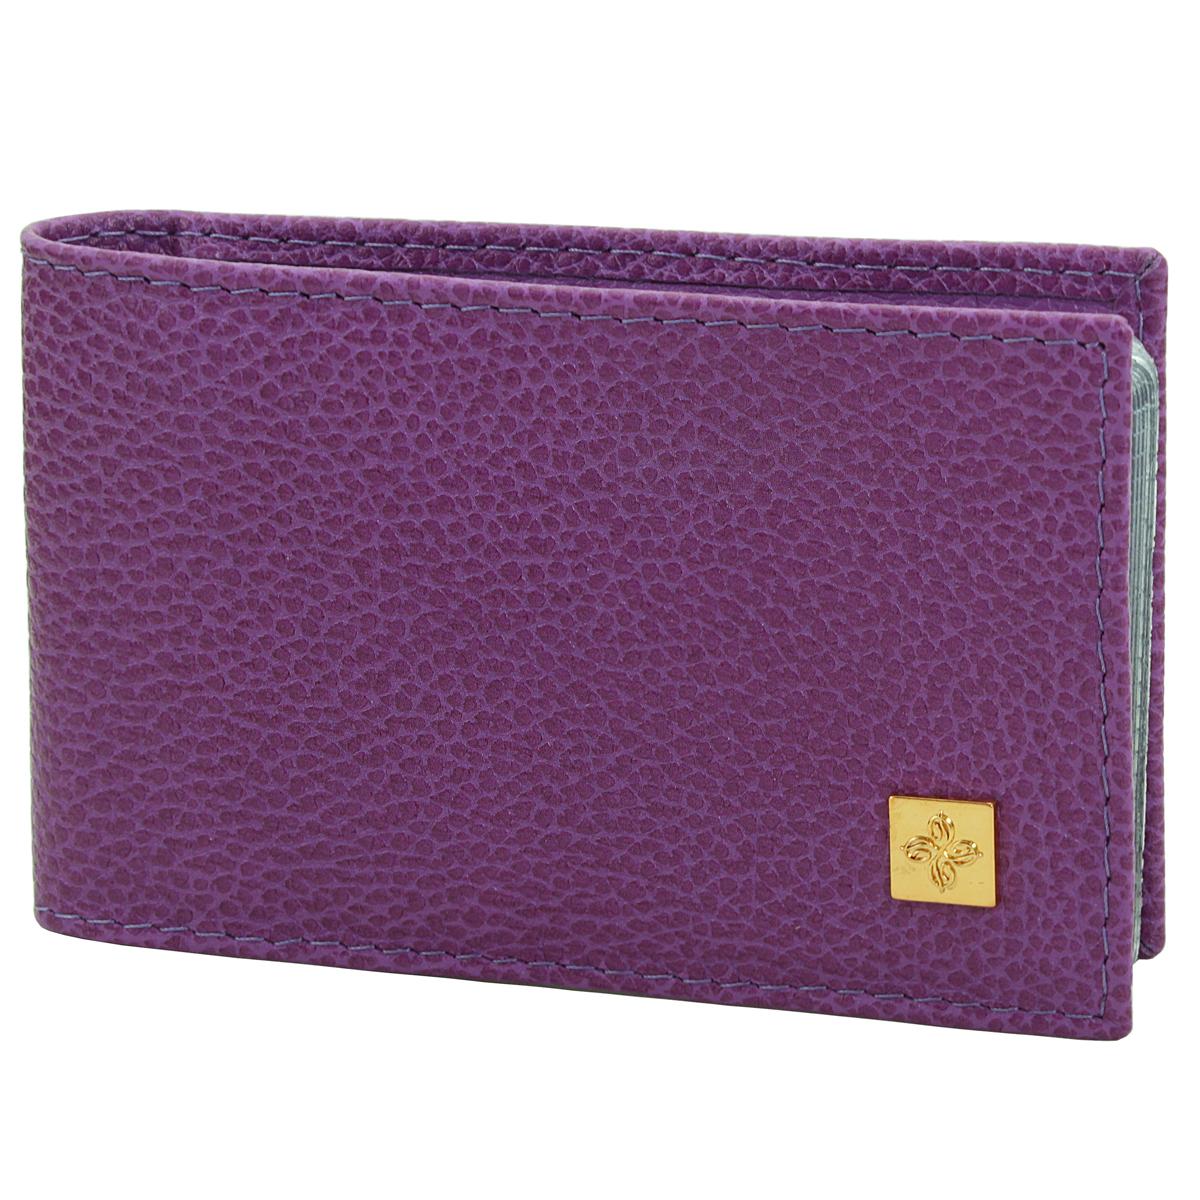 "Визитница Dimanche ""Purpur"", цвет: пурпурный. 104"